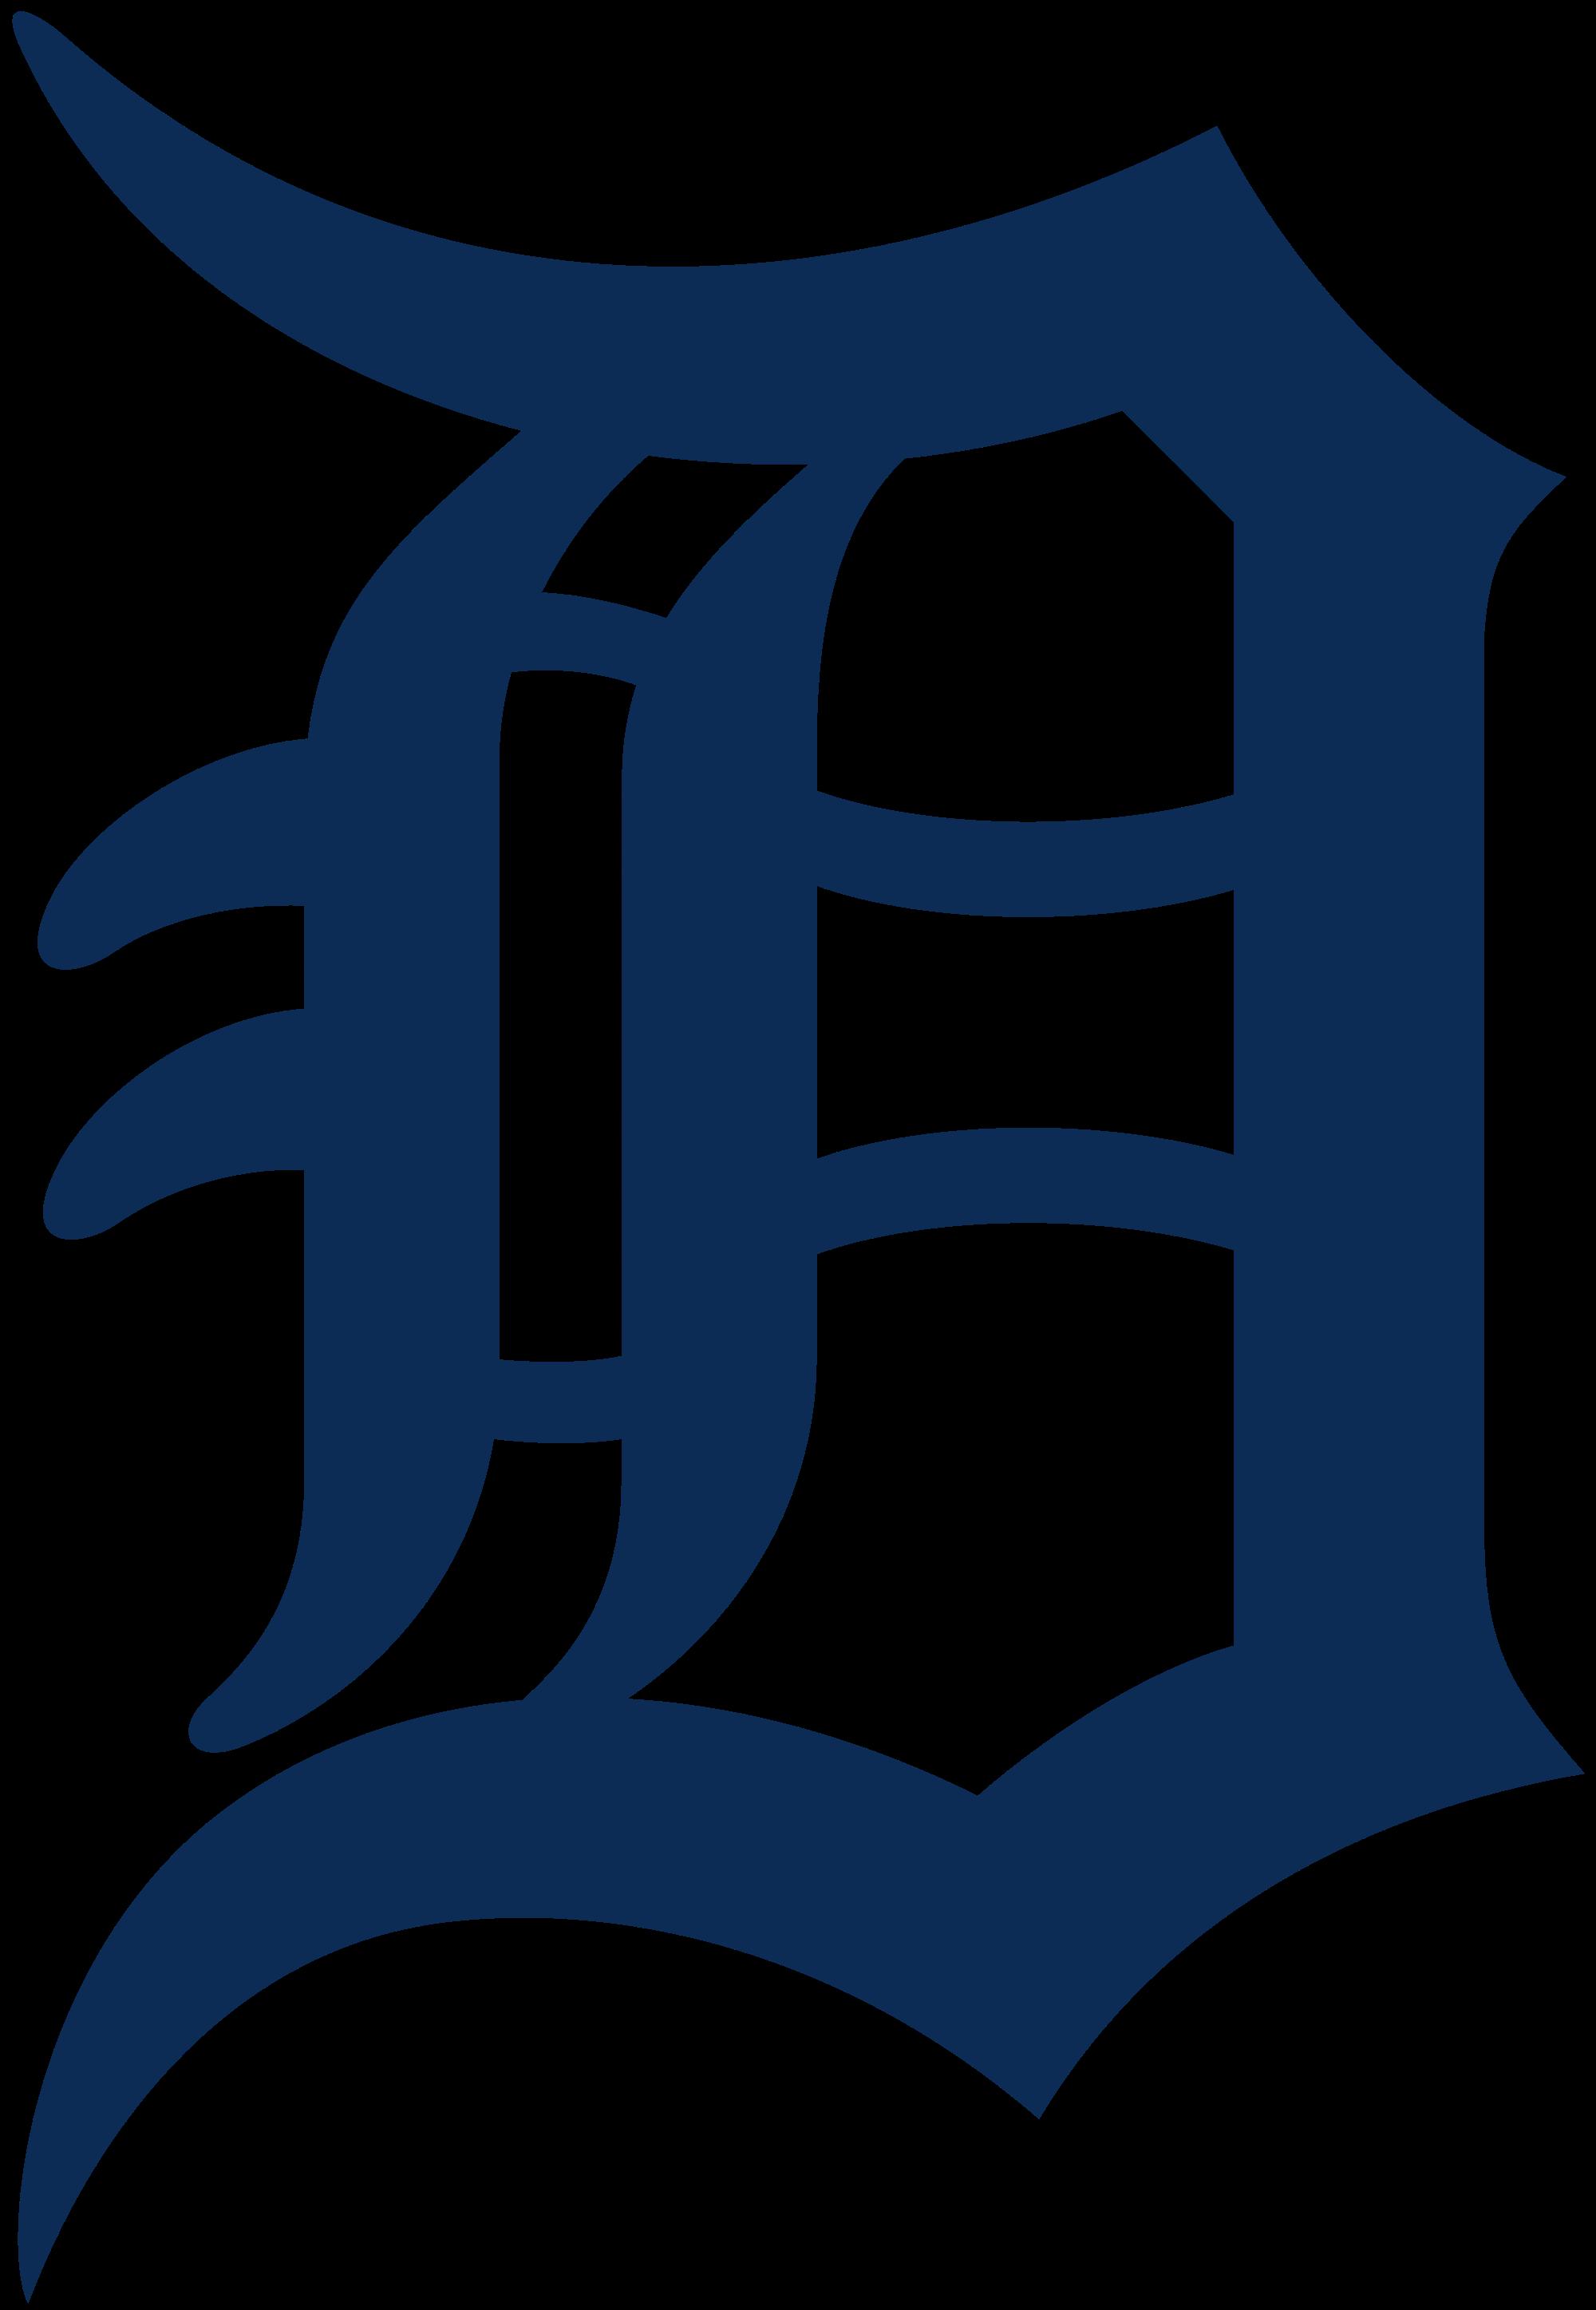 Detroit tigers baseball clipart picture transparent stock File:Detroit Tigers logo.svg - Wikimedia Commons picture transparent stock